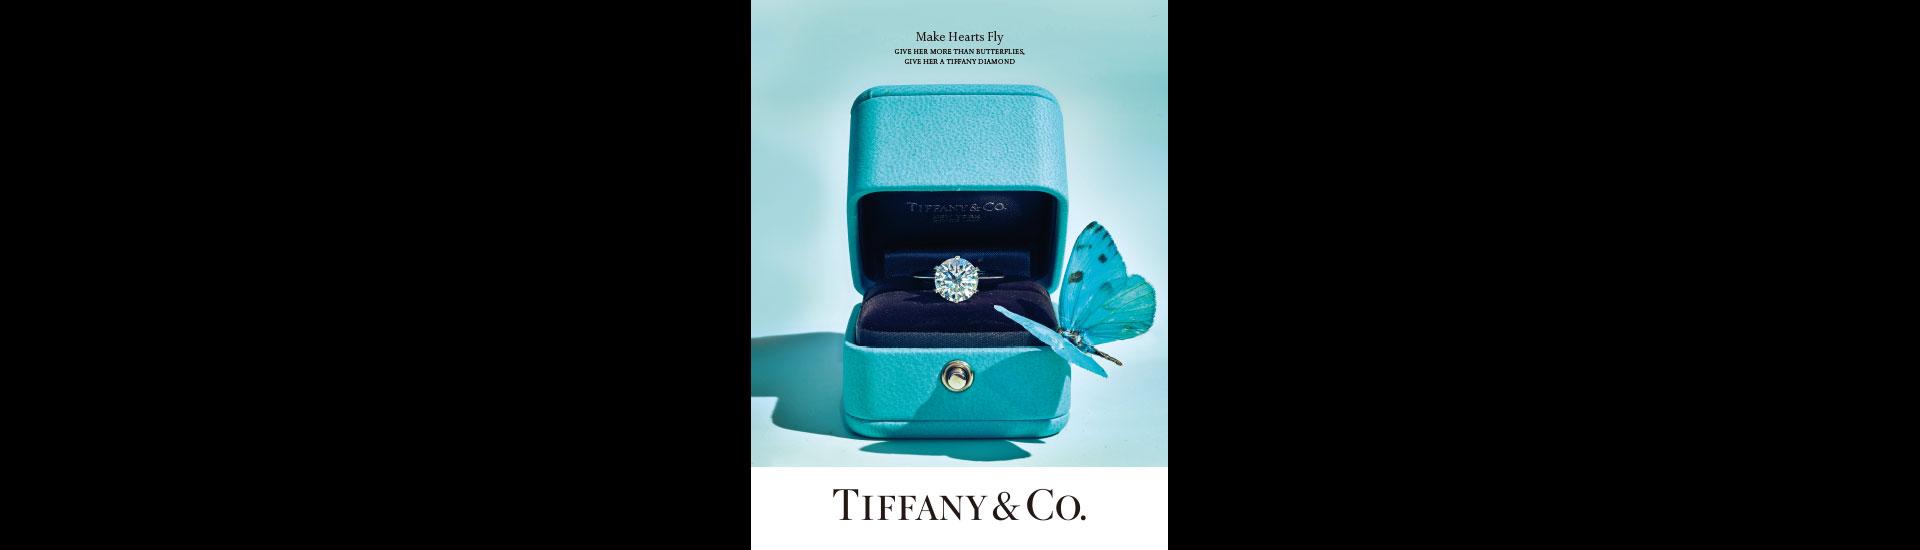 復興館2F Tiffany&Co.期間限定傳情站